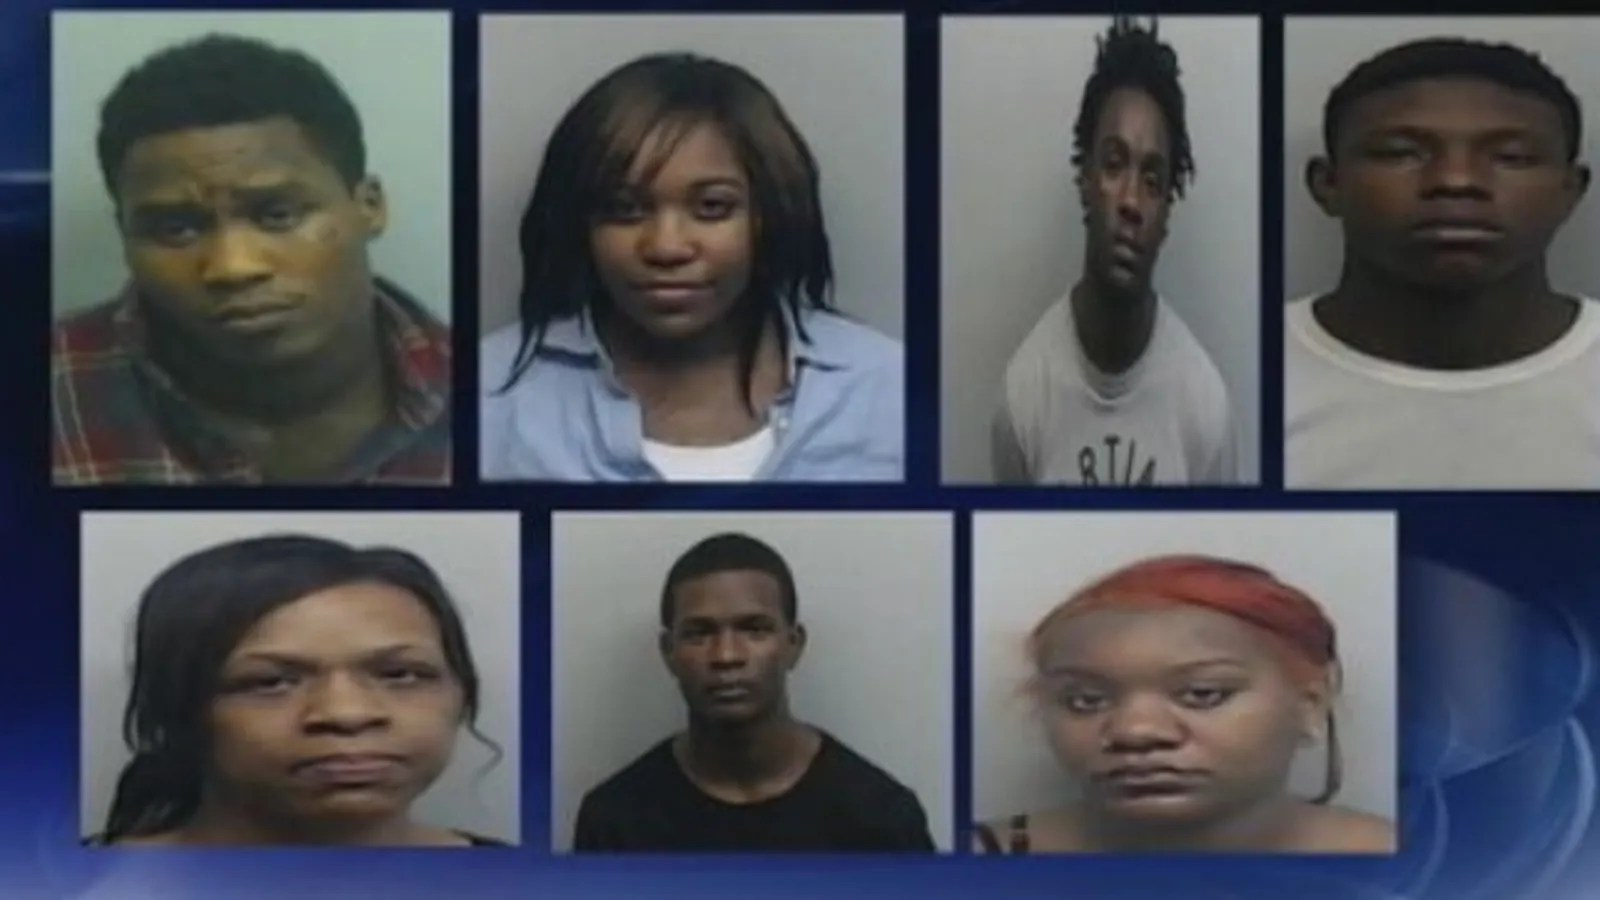 Police Atlanta Gang Members Used Fake Craigslist Car Ads